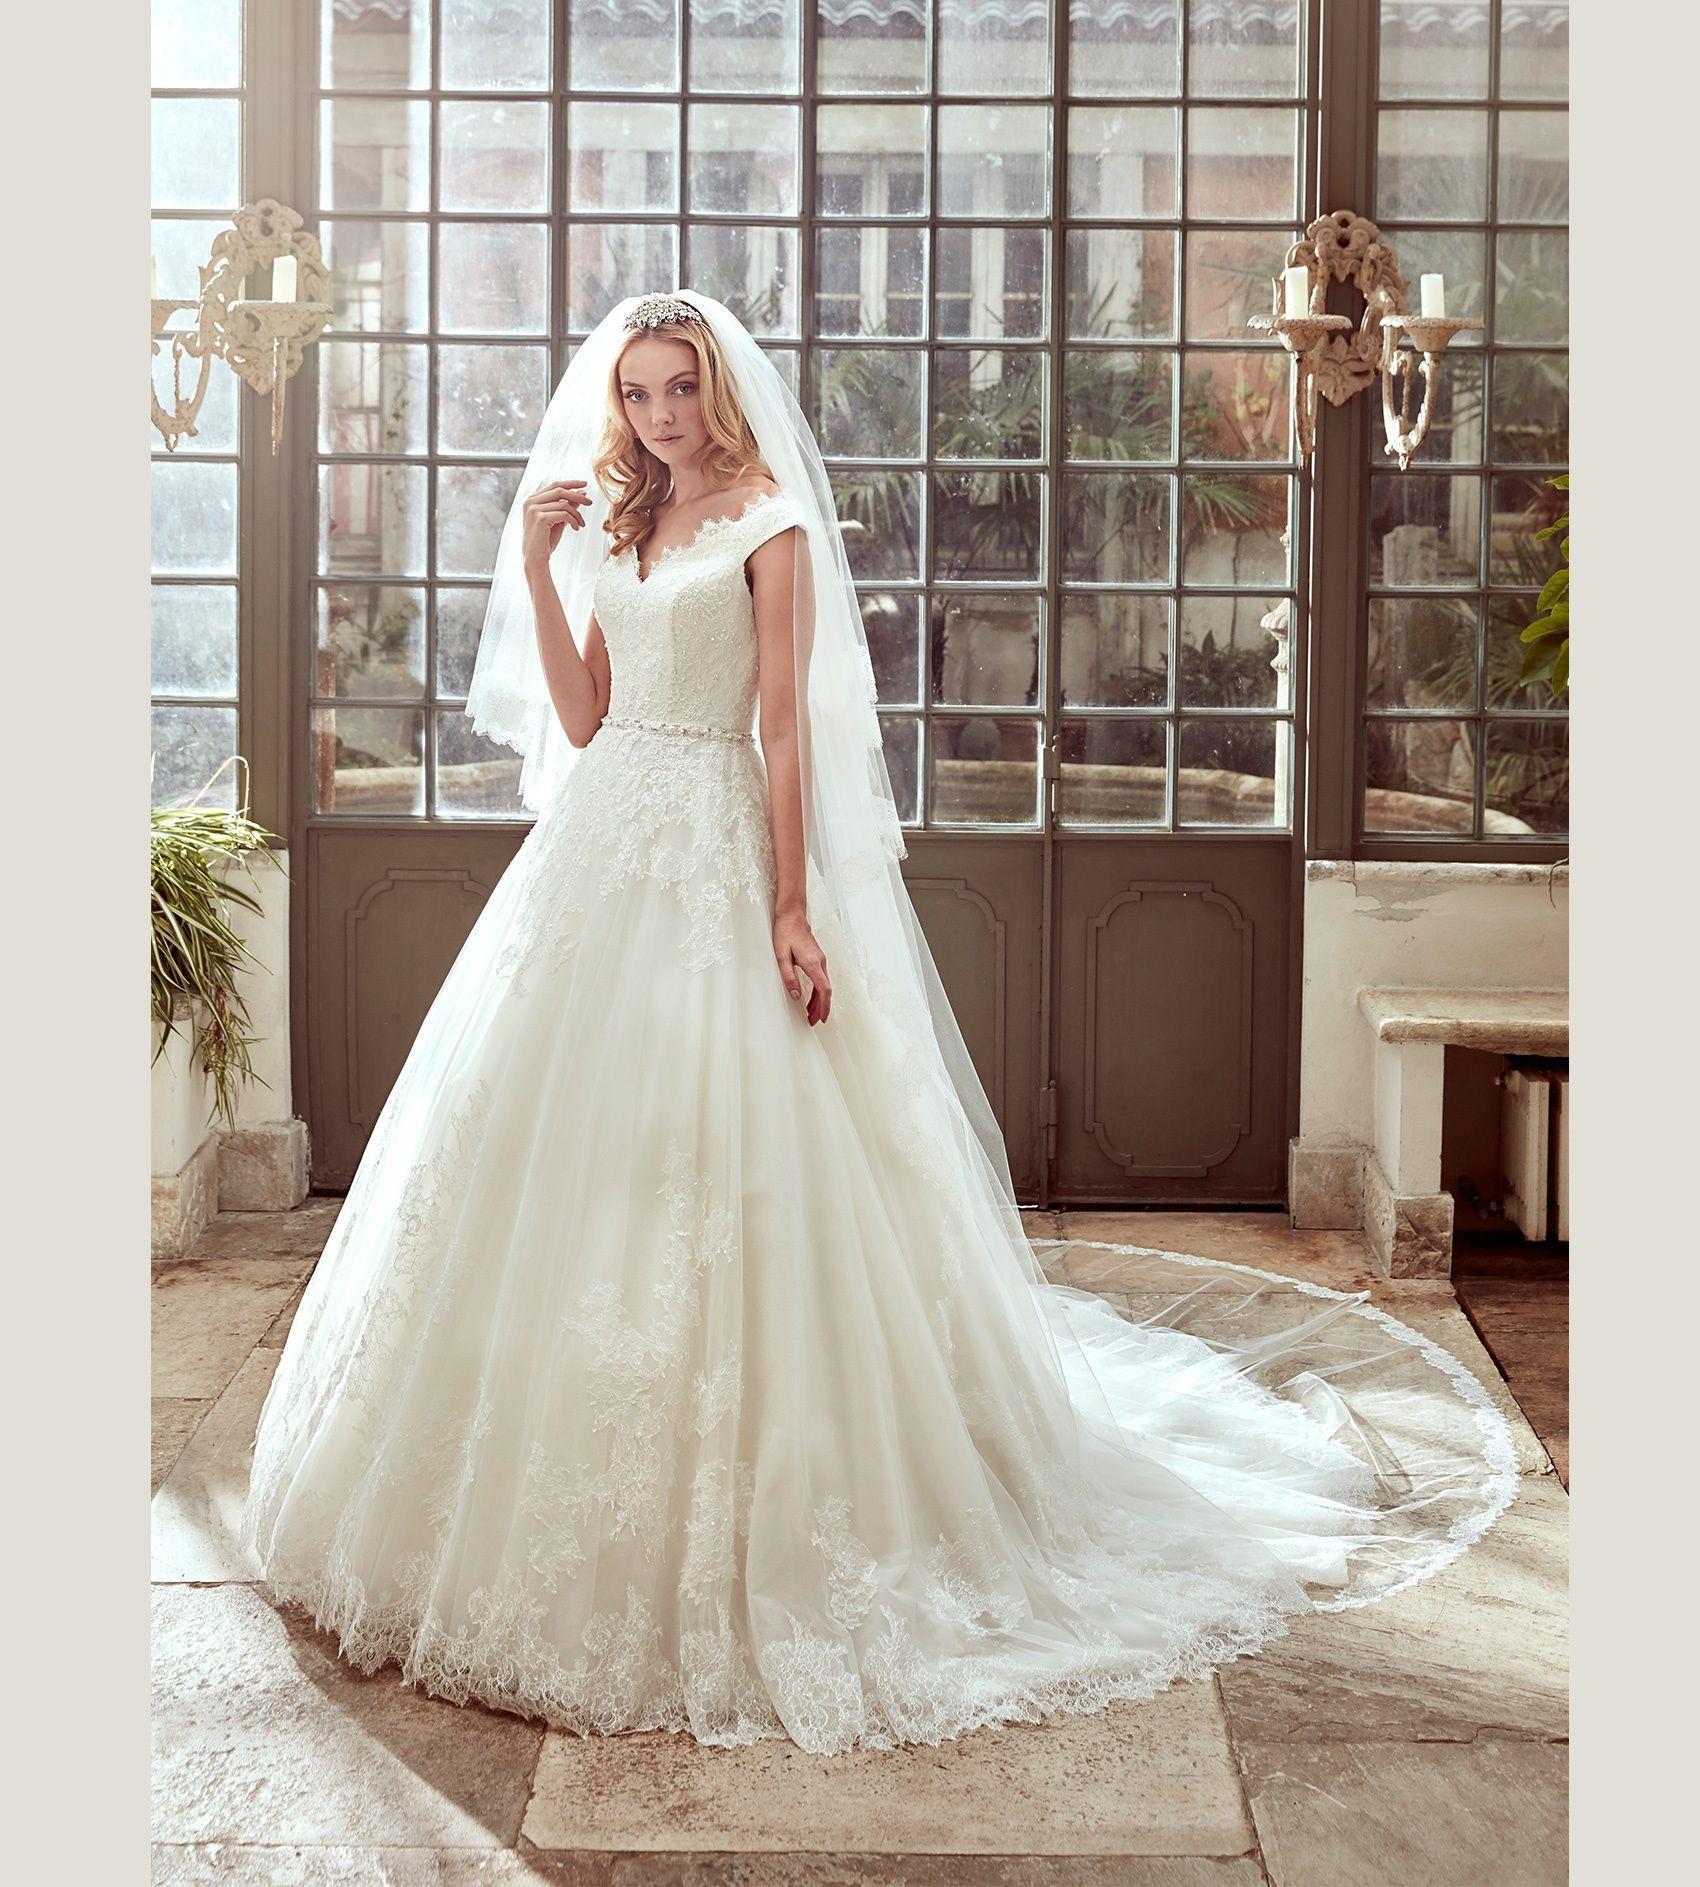 Mariage de mode 2017 collection nicole niab17081 robe for Prix de robe de mariage nicole